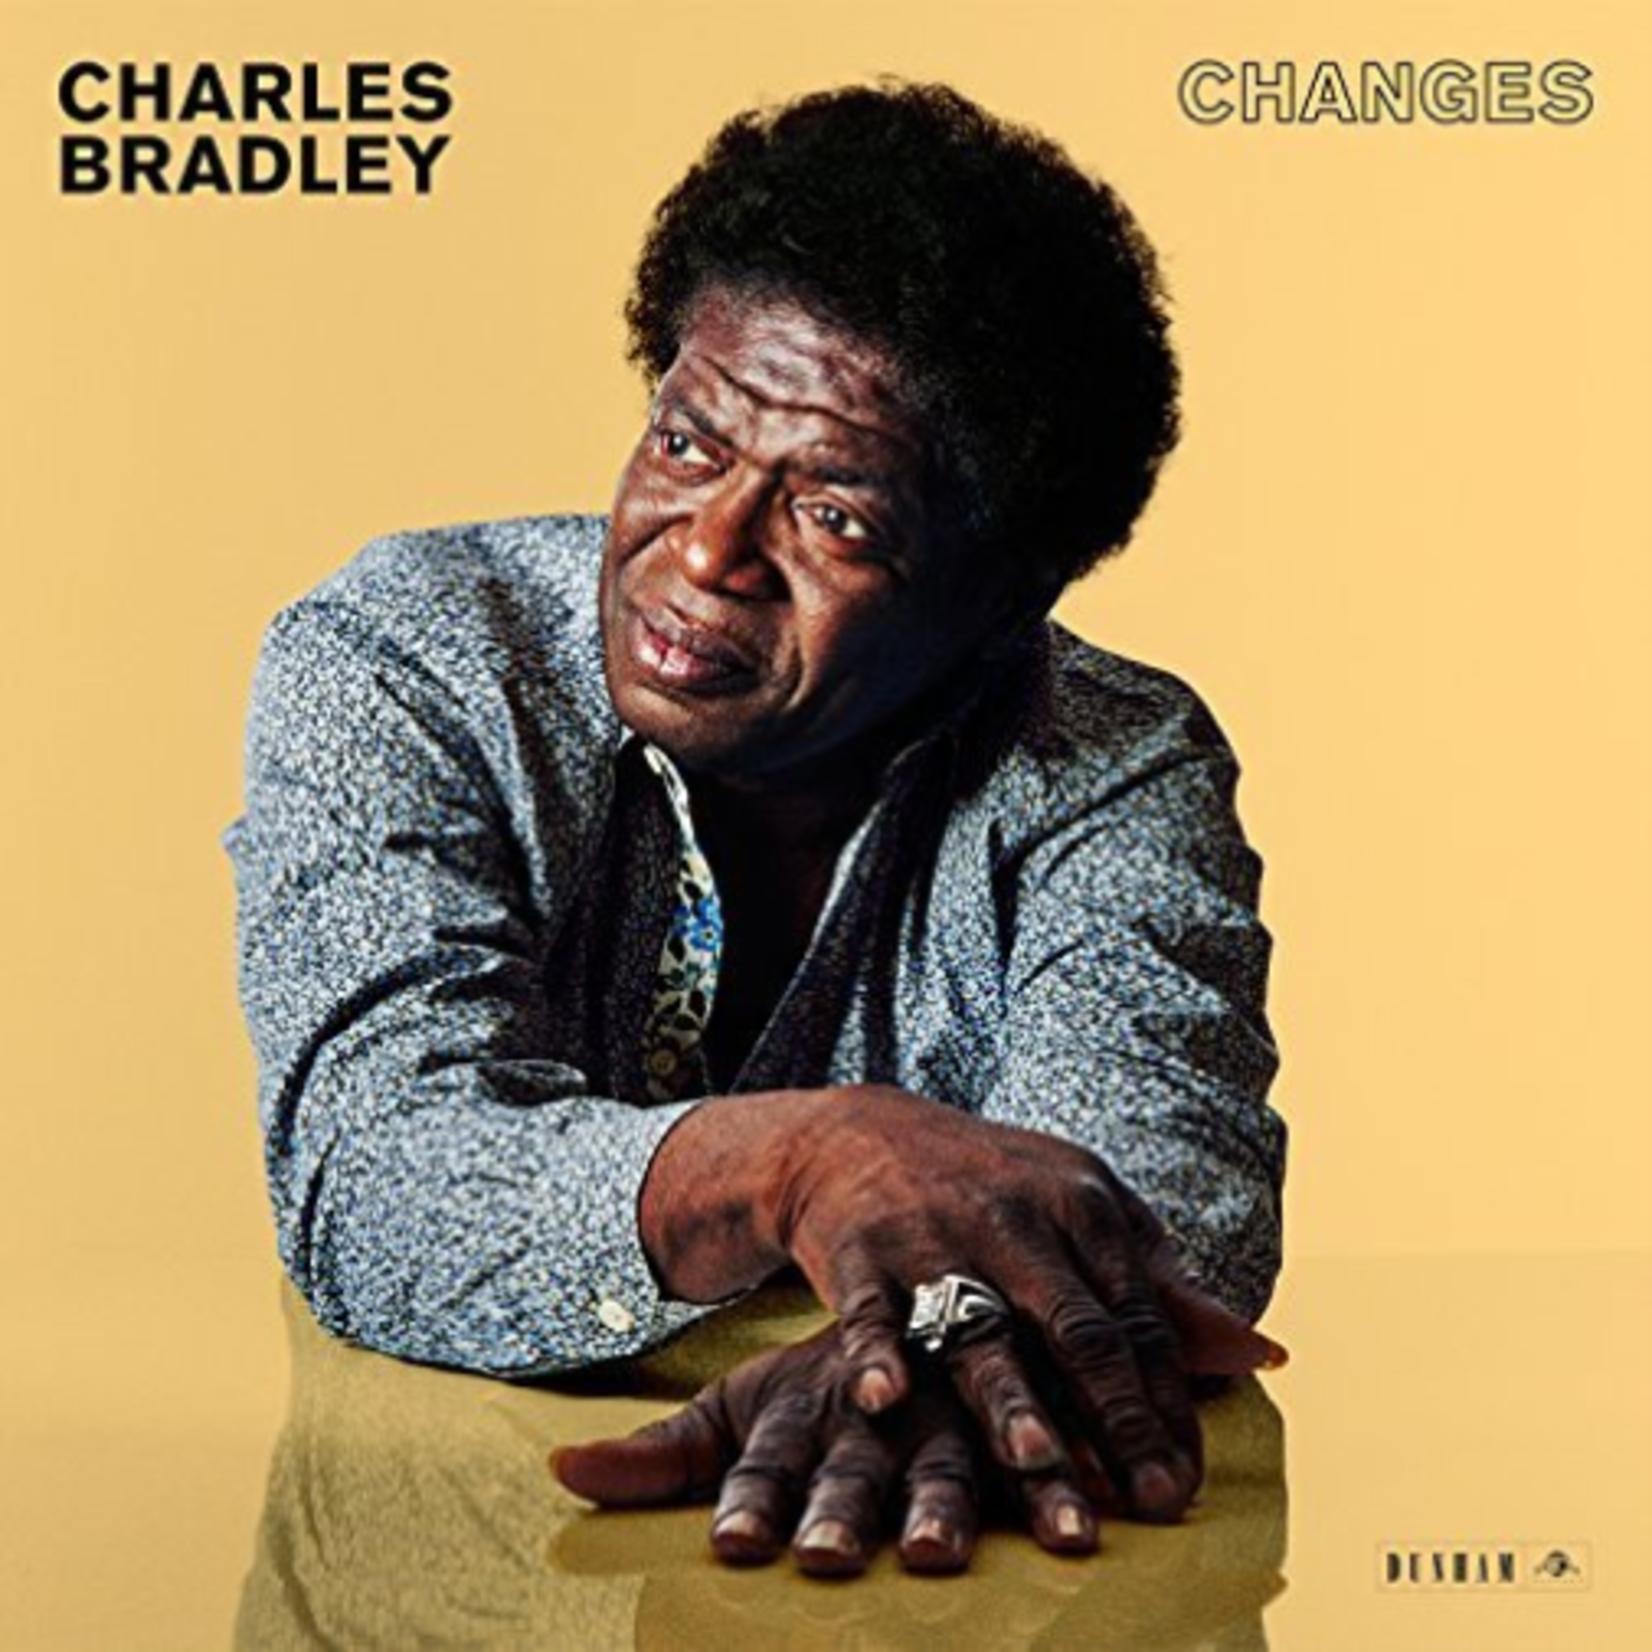 CHARLES BRADLEY CHANGES